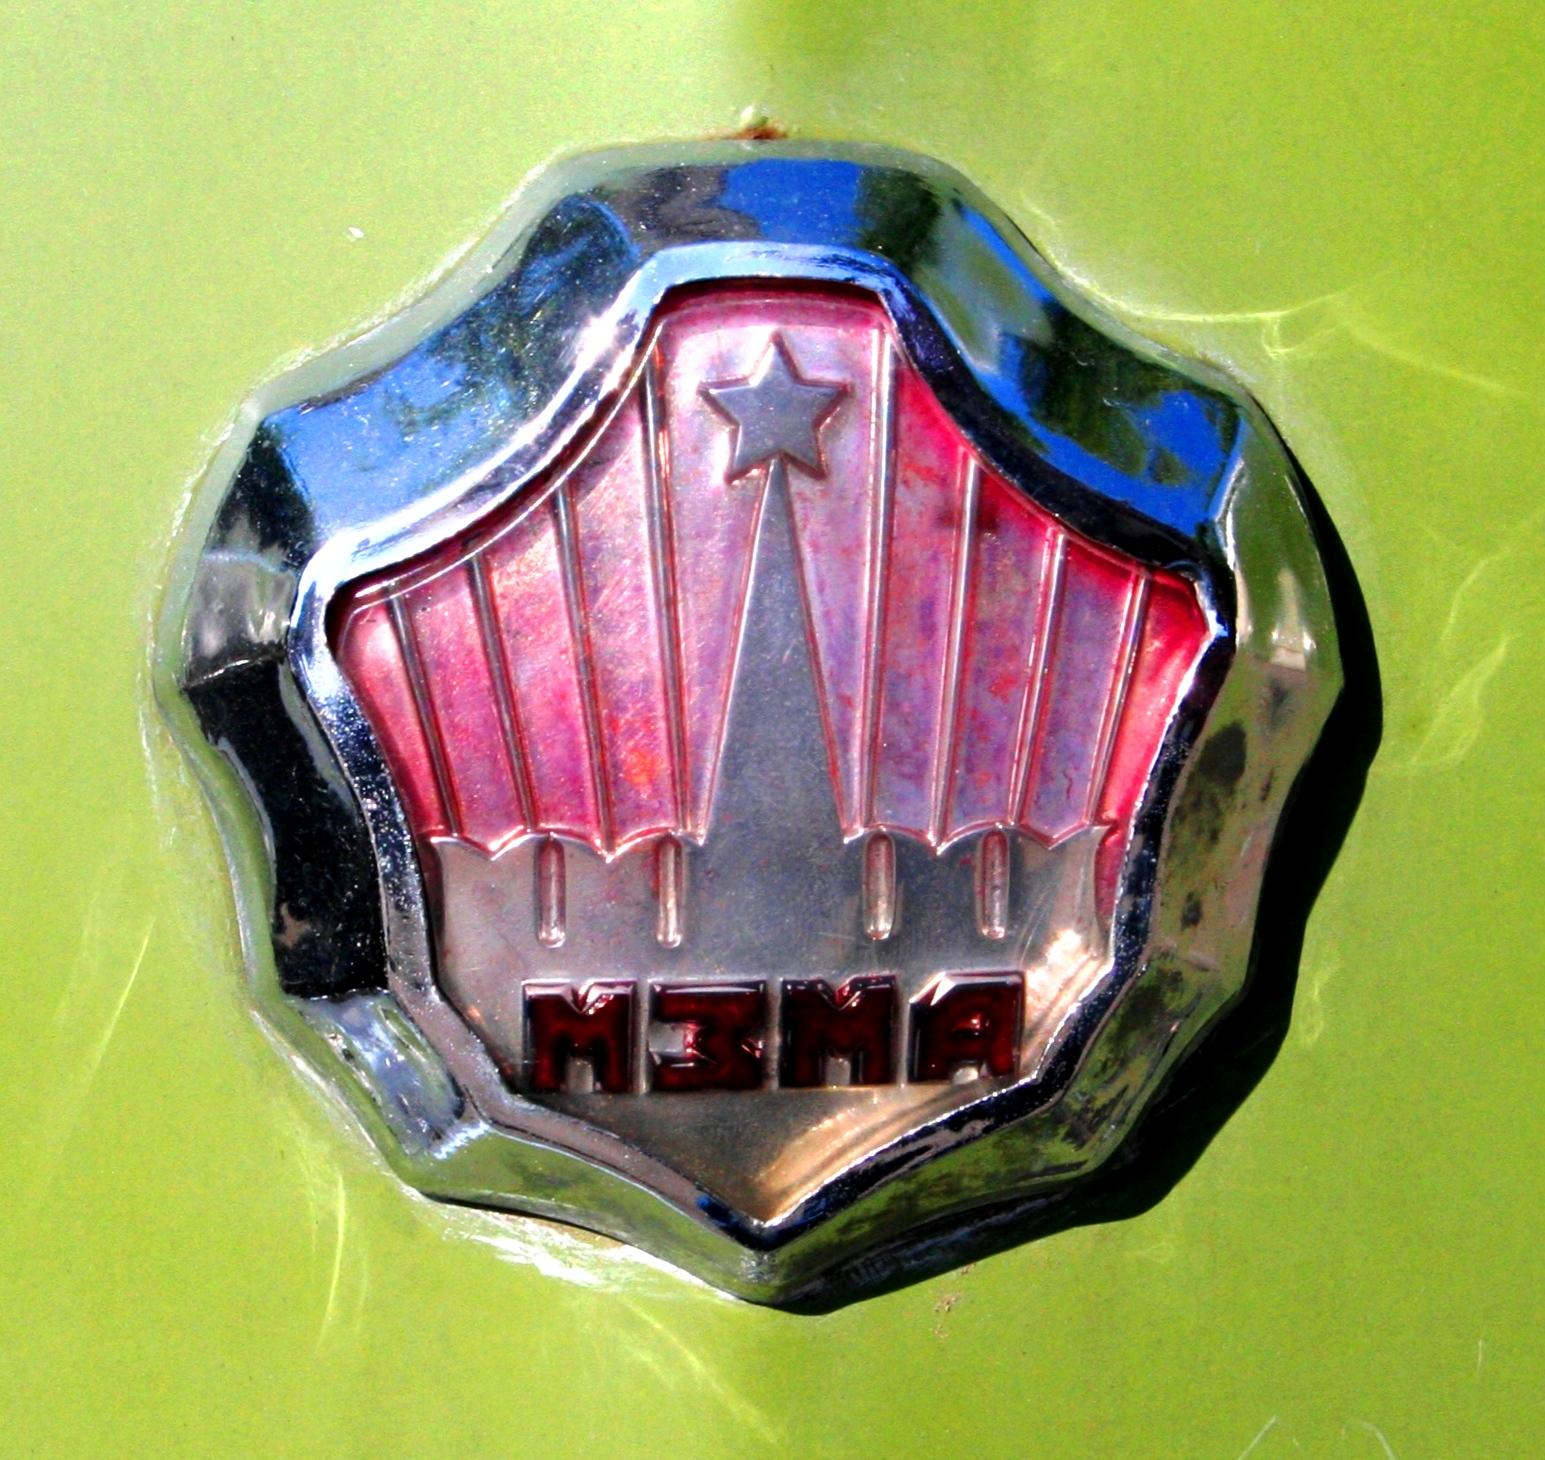 See to - автозаводы ссср эмблема - see2me: see2me.ru/avtozavody-sssr-emblema.html